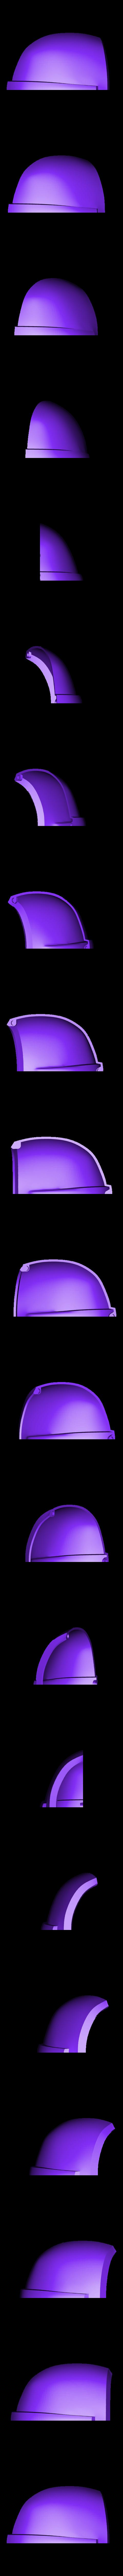 Part_15_v4.stl Download free STL file  Blood Dragon Helmet Mass Effect 2 (With Back Access) • 3D printable template, VillainousPropShop